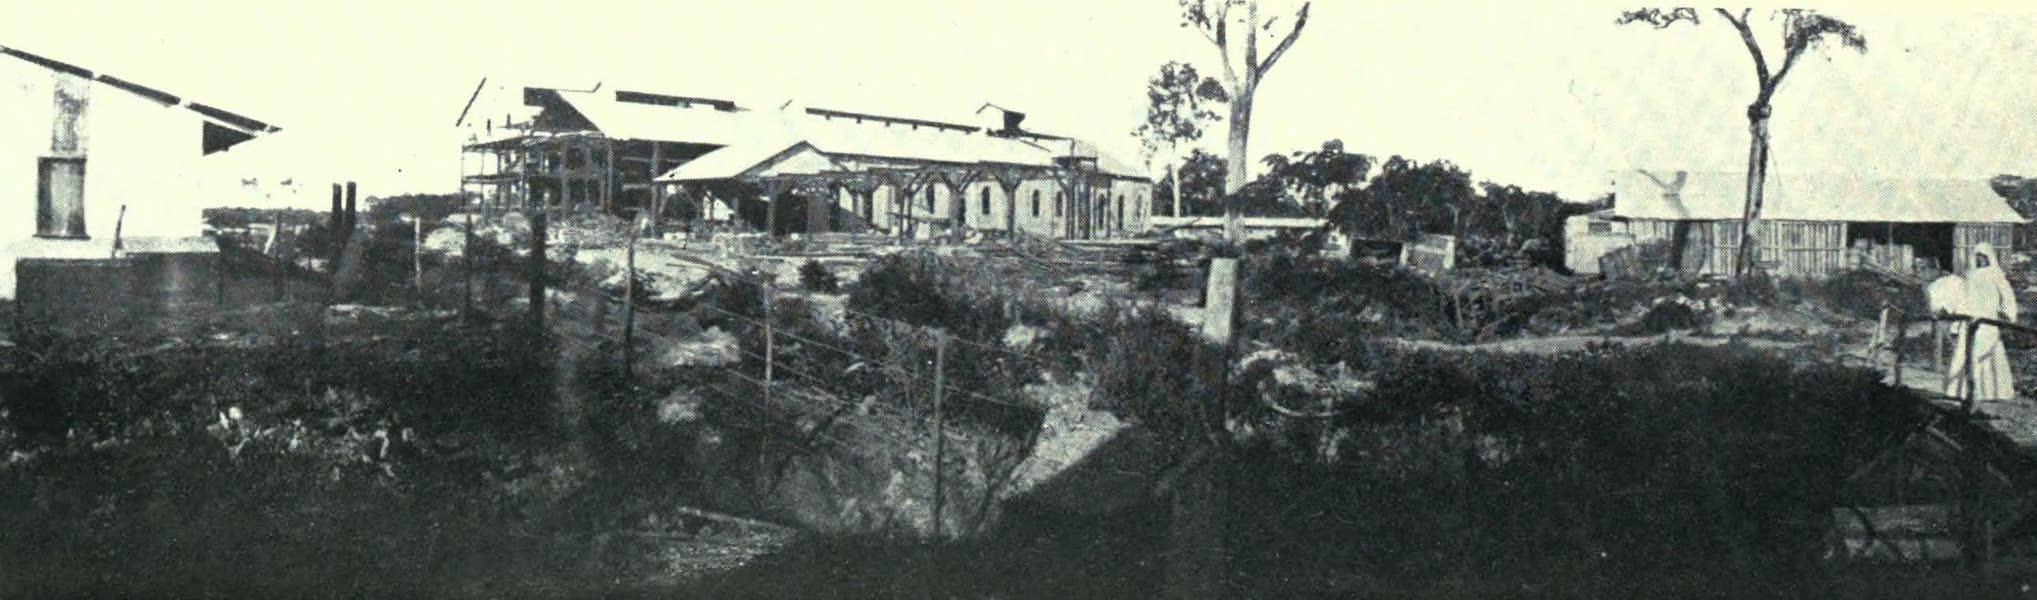 Paraguay by Henry Koebel - A Quebracho Factory [II] (1917)